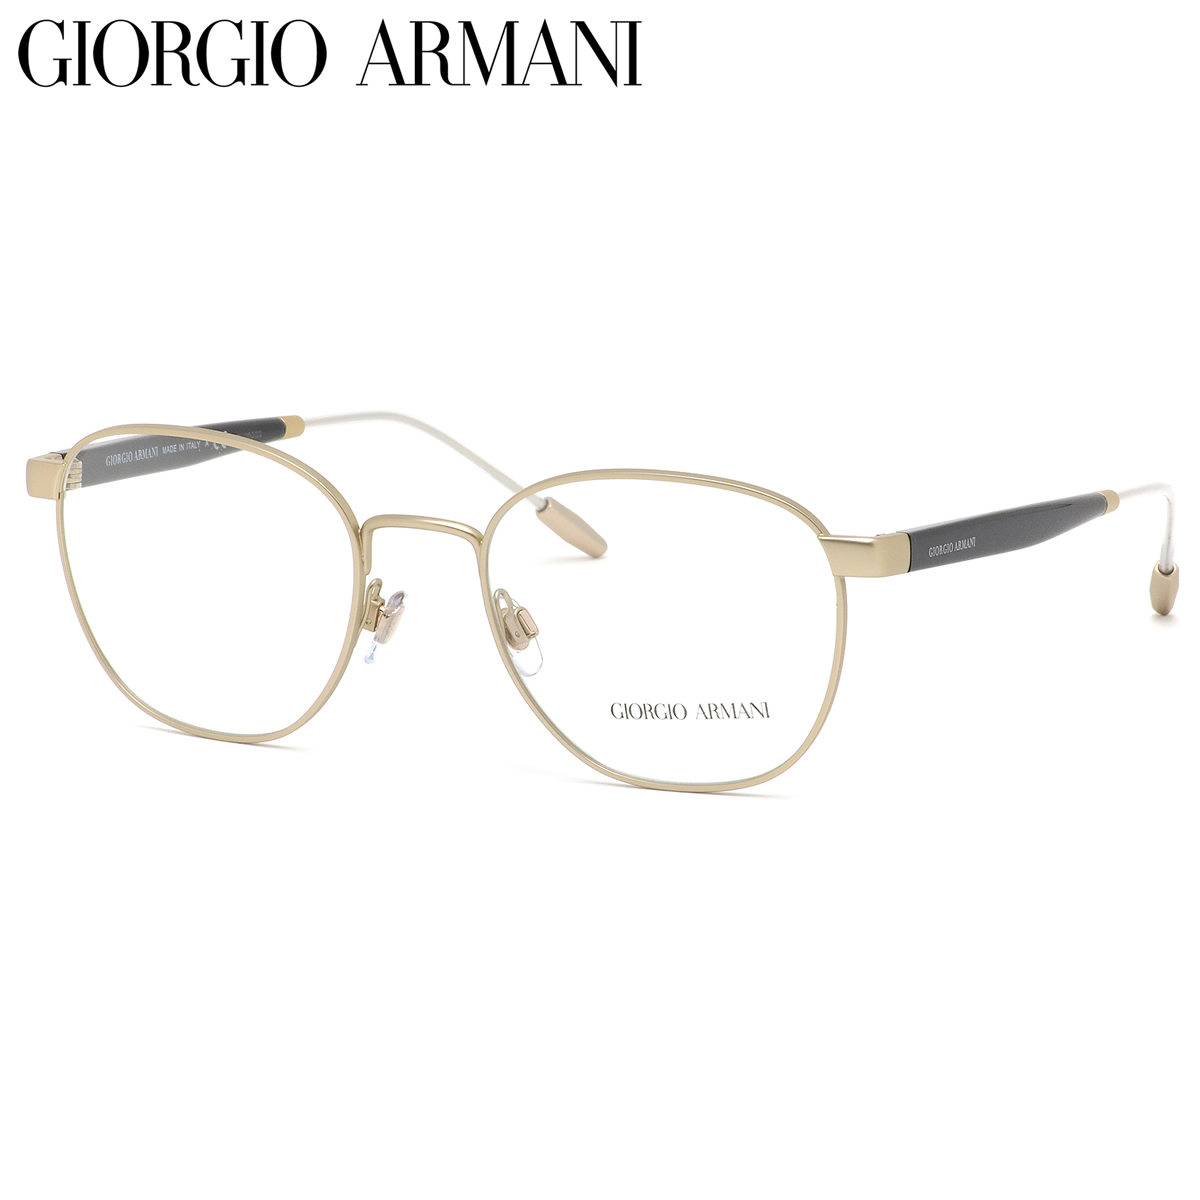 GIORGIO ARMANI ジョルジオアルマーニ メガネ AR5091 3002 52サイズ コンビネーションフレーム 軽い ジョルジオアルマーニGIORGIOARMANI メンズ レディース